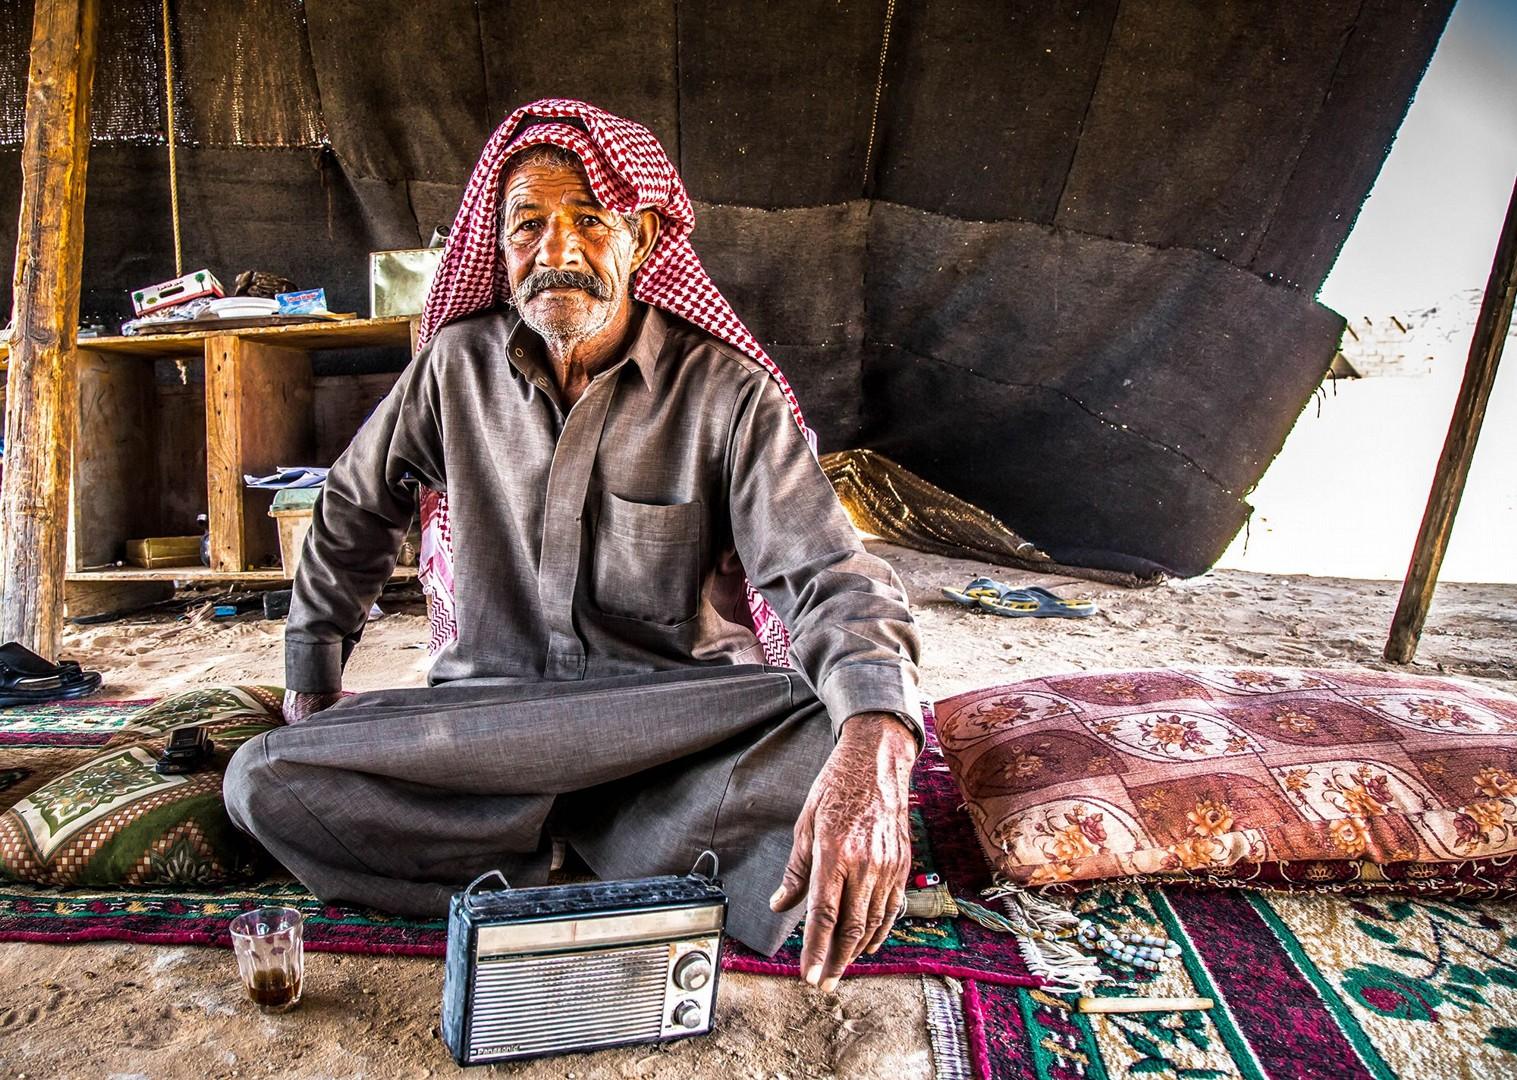 local-culture-people-jordan-cycling-adventures-cultural-holiday.jpg - NEW! Jordan - Petra, Wadi Rum & the Dead Sea - Cycling Adventures